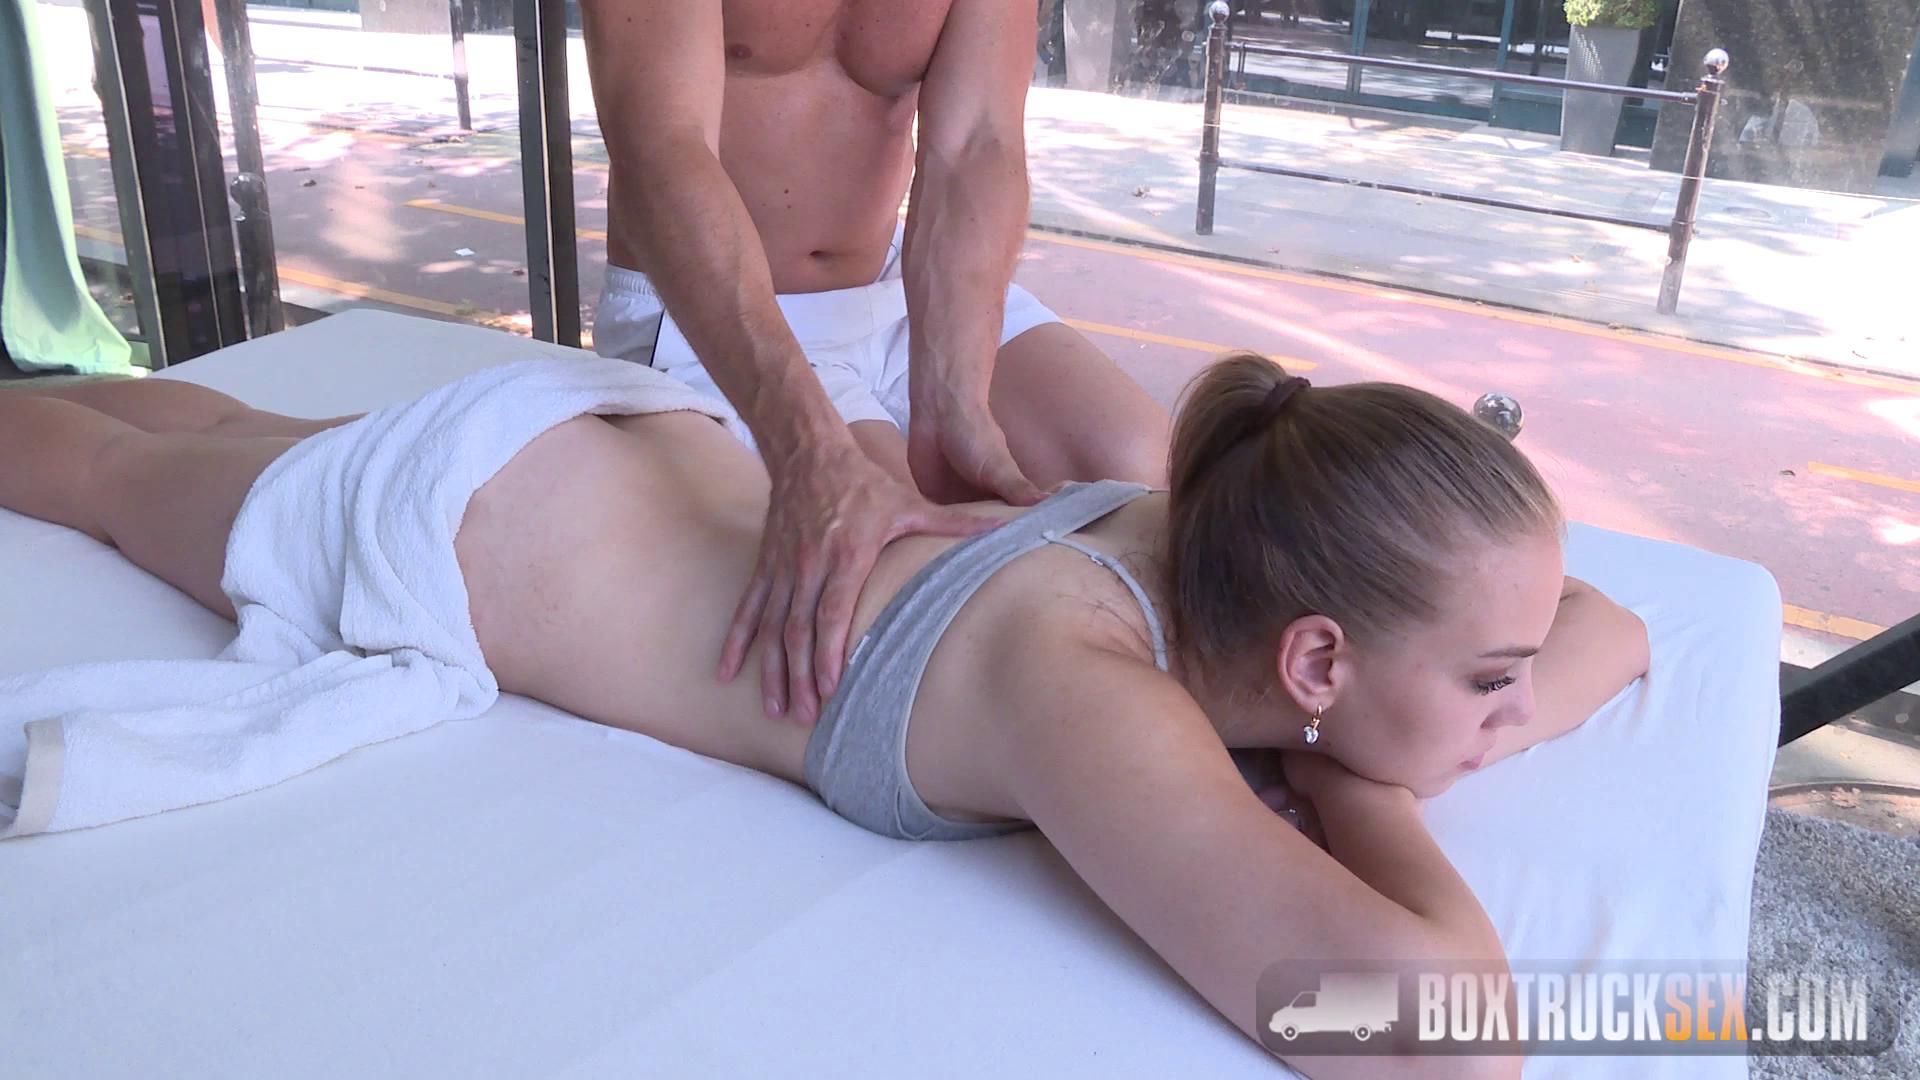 BoxTruckSex – Eva Briancon